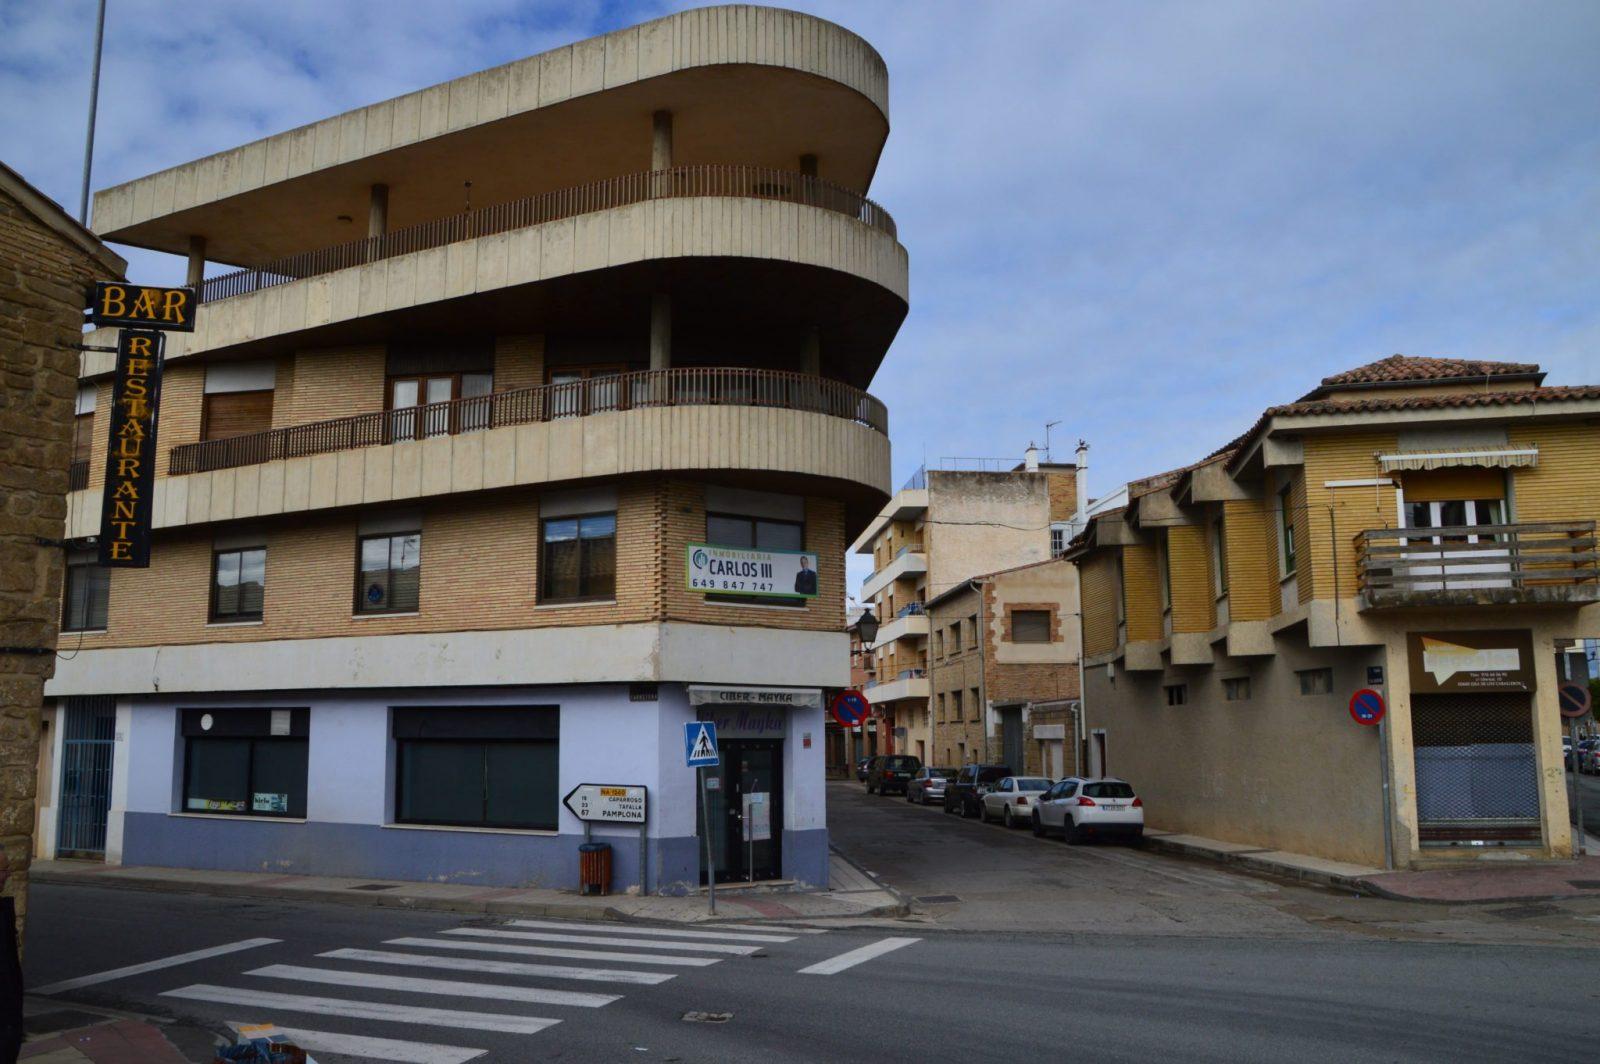 Piso Calle Carretera, 53, 1